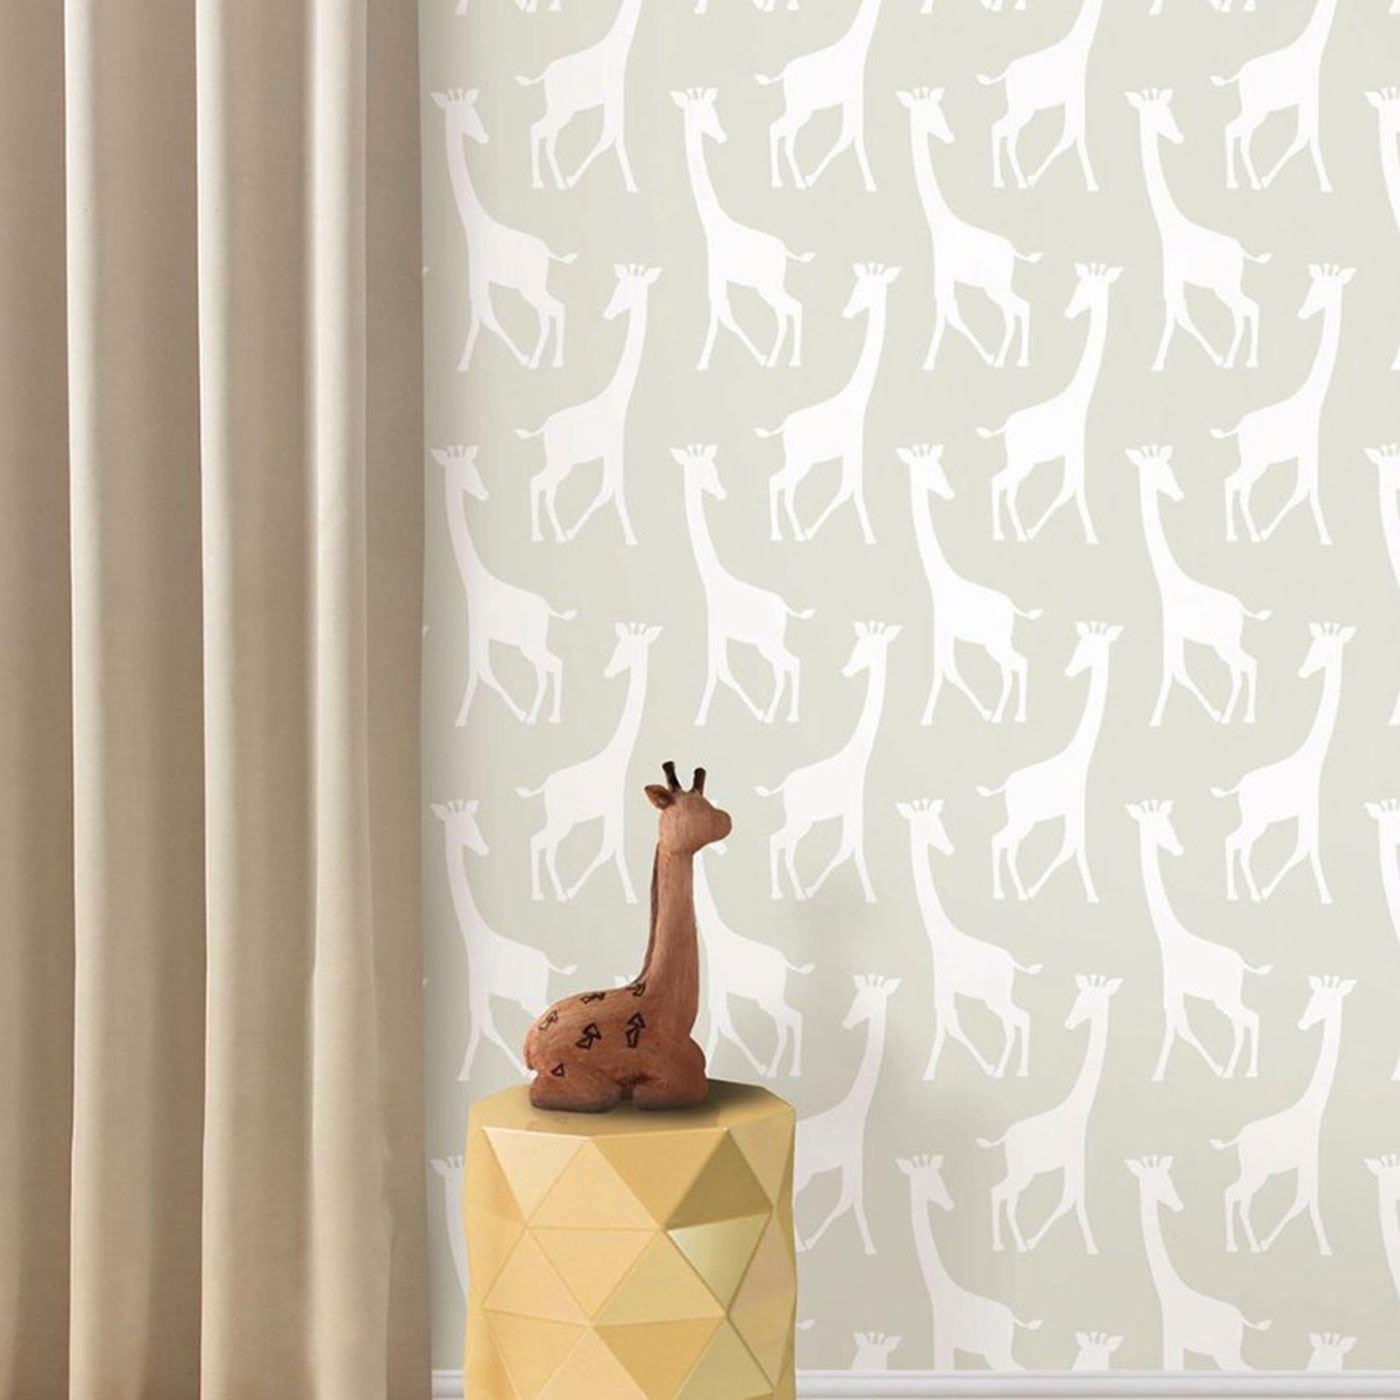 buccia e bastone carte da parati camera da letto decorazione muro ... - Decorazioni Muri Camera Da Letto